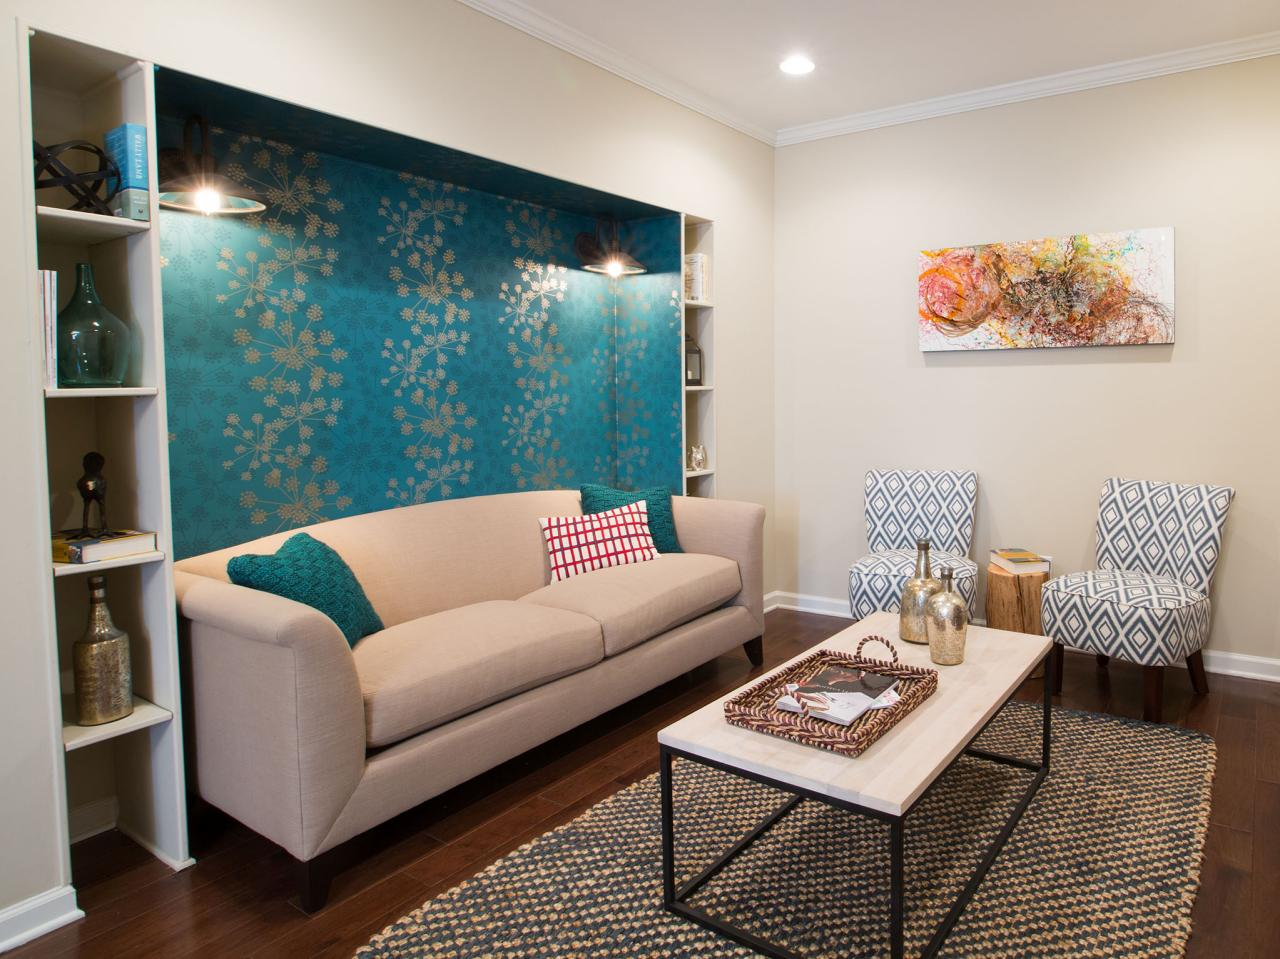 teal wallpaper interior design photo - 6